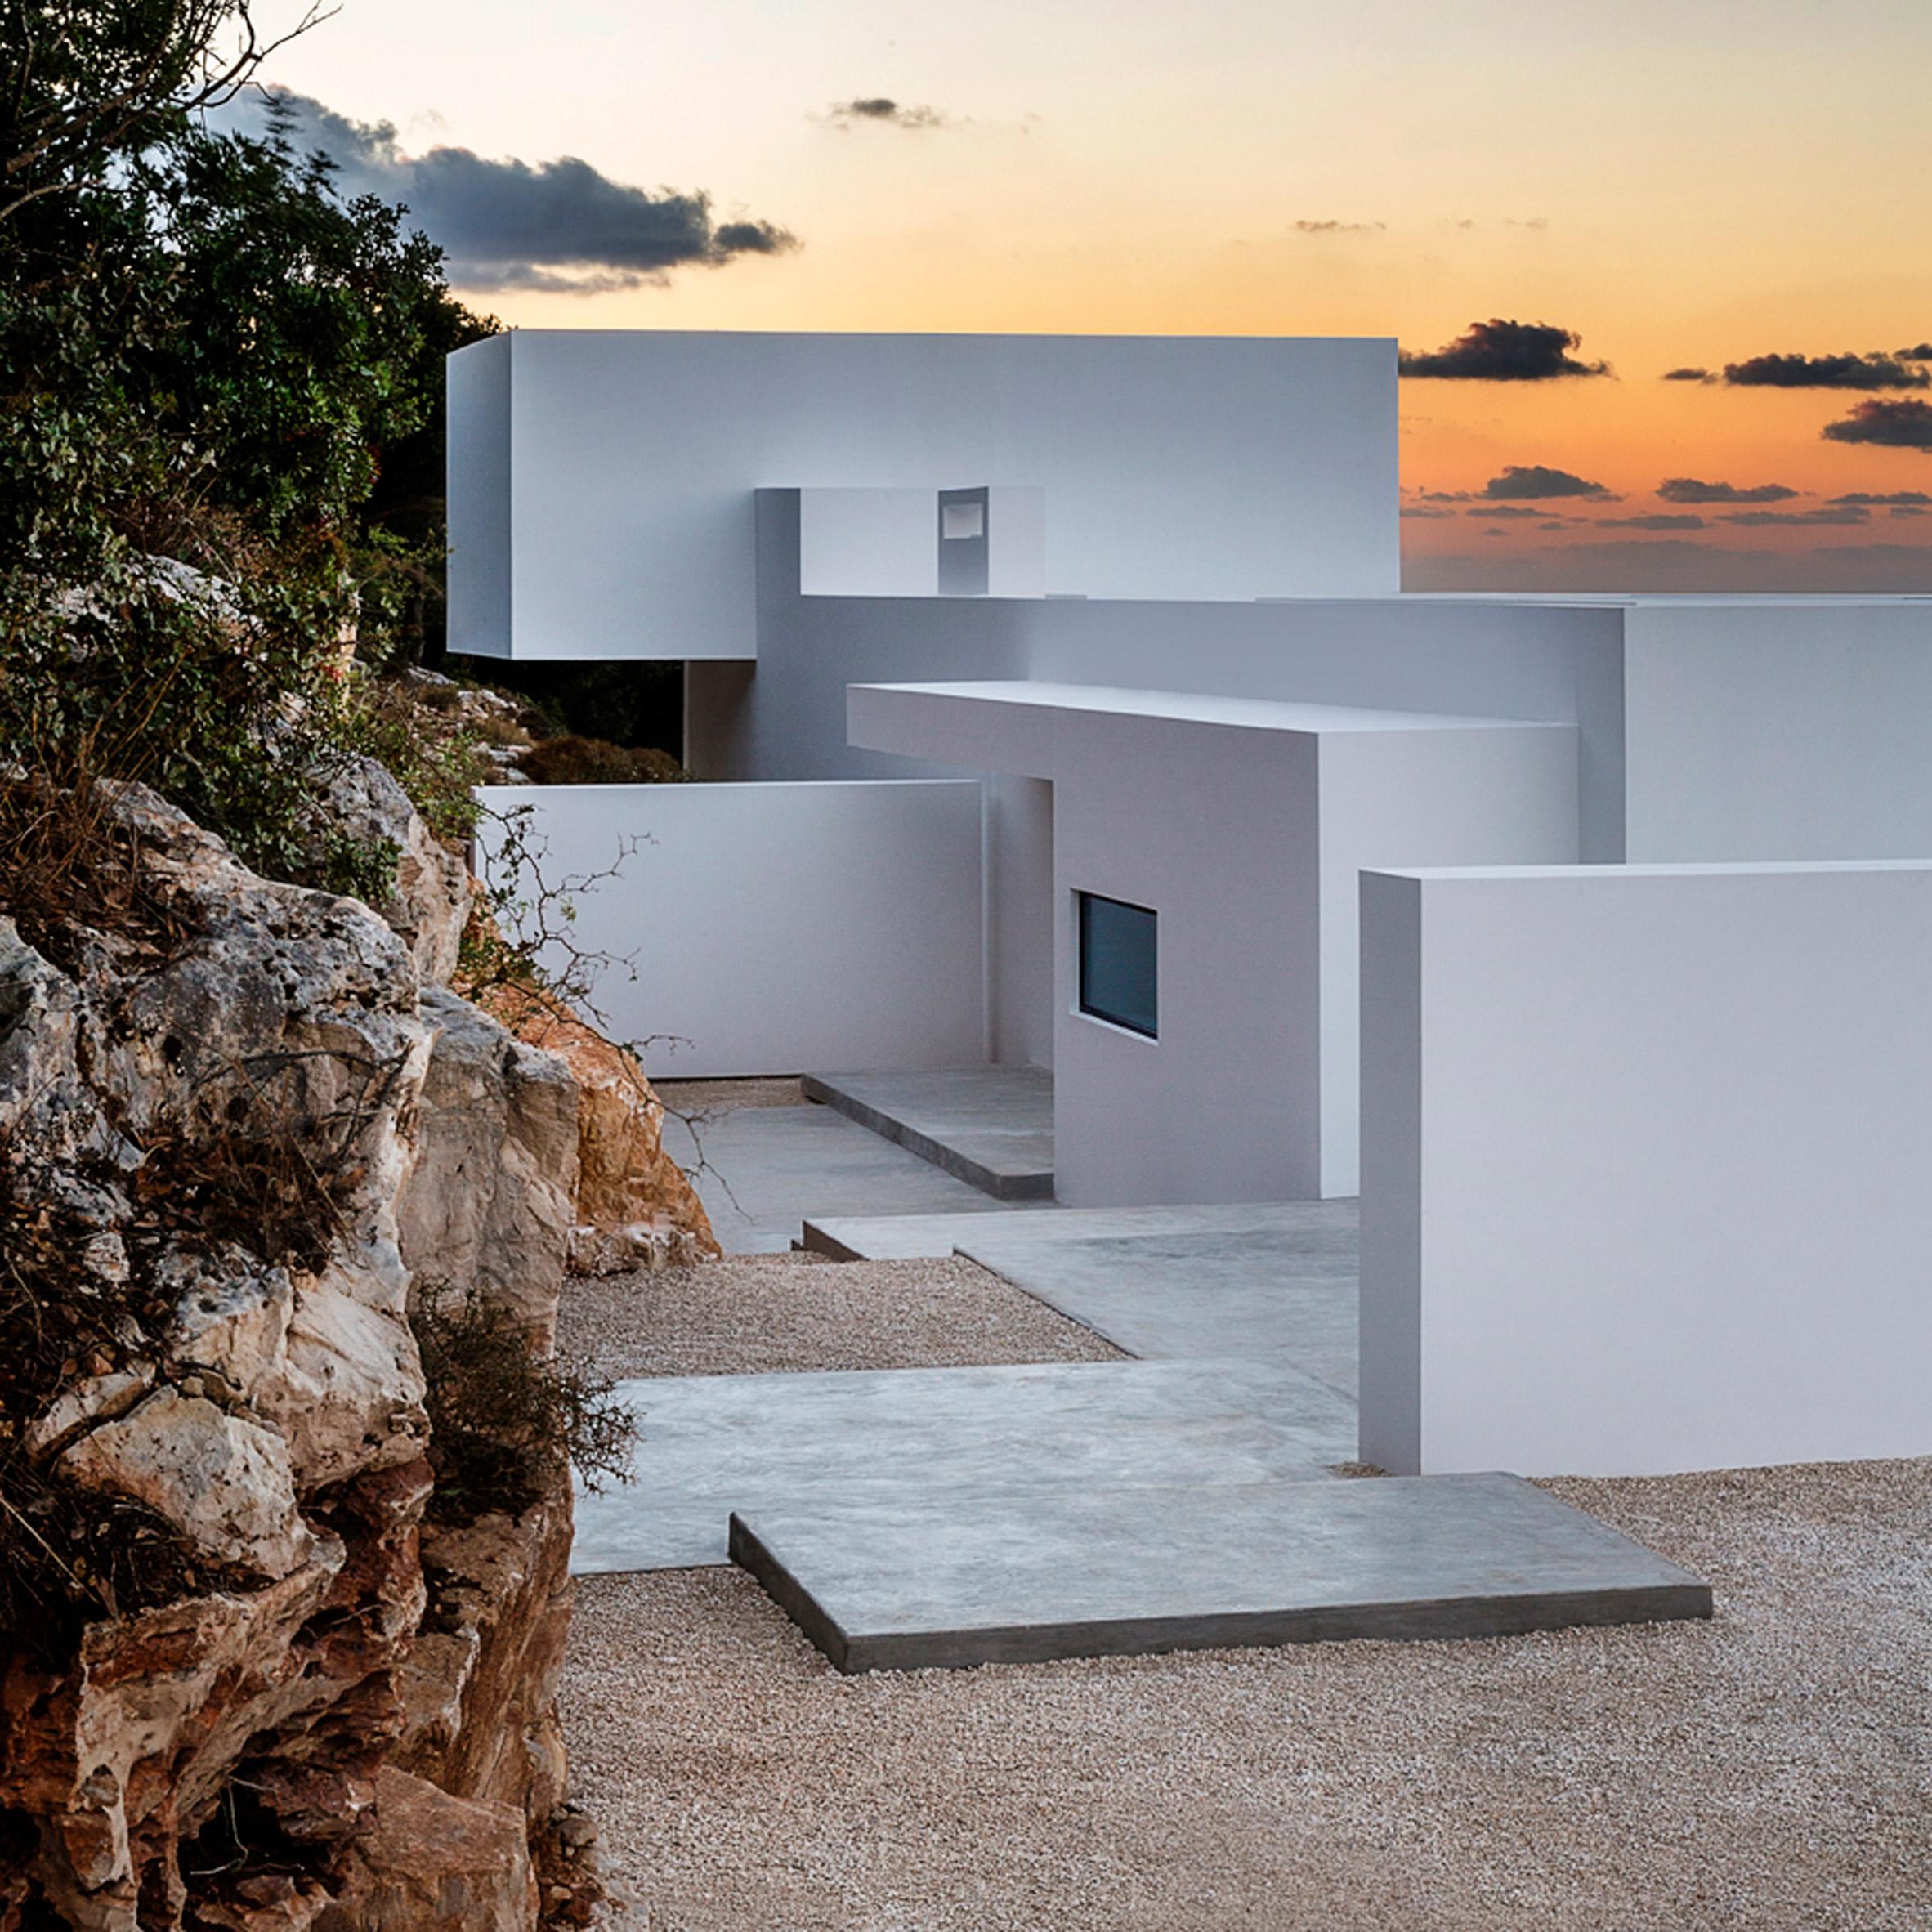 10 idyllic Greek island retreats from Dezeen's Pinterest boards